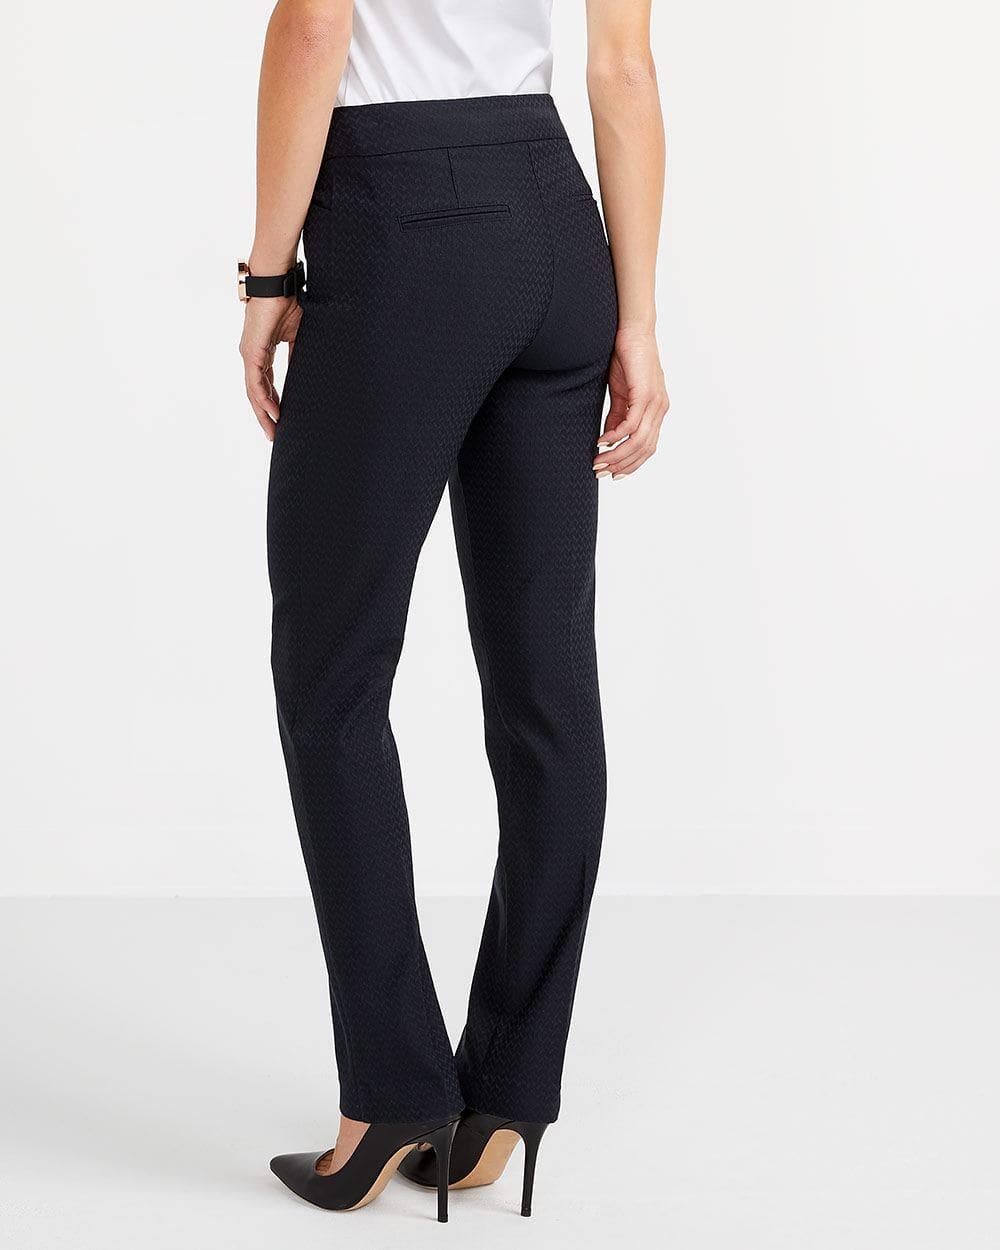 The Petite Iconic Straight Leg Herringbone Pants